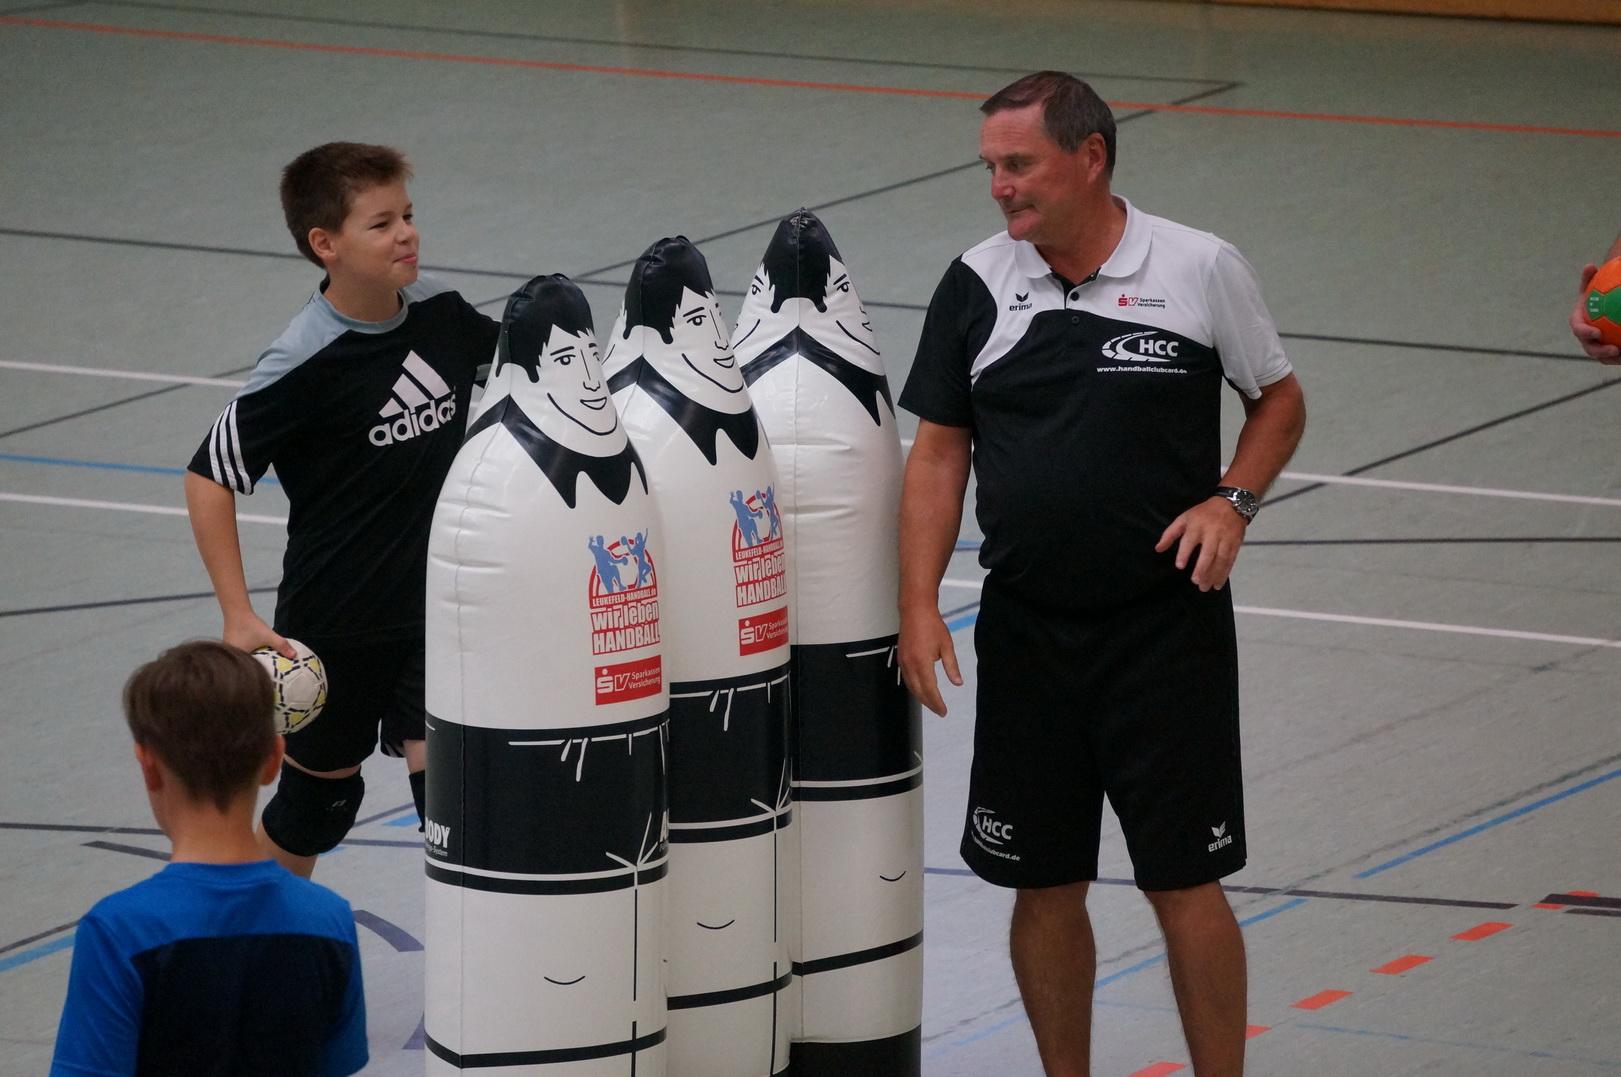 201808_Handballcamp_SDH_MG_245w